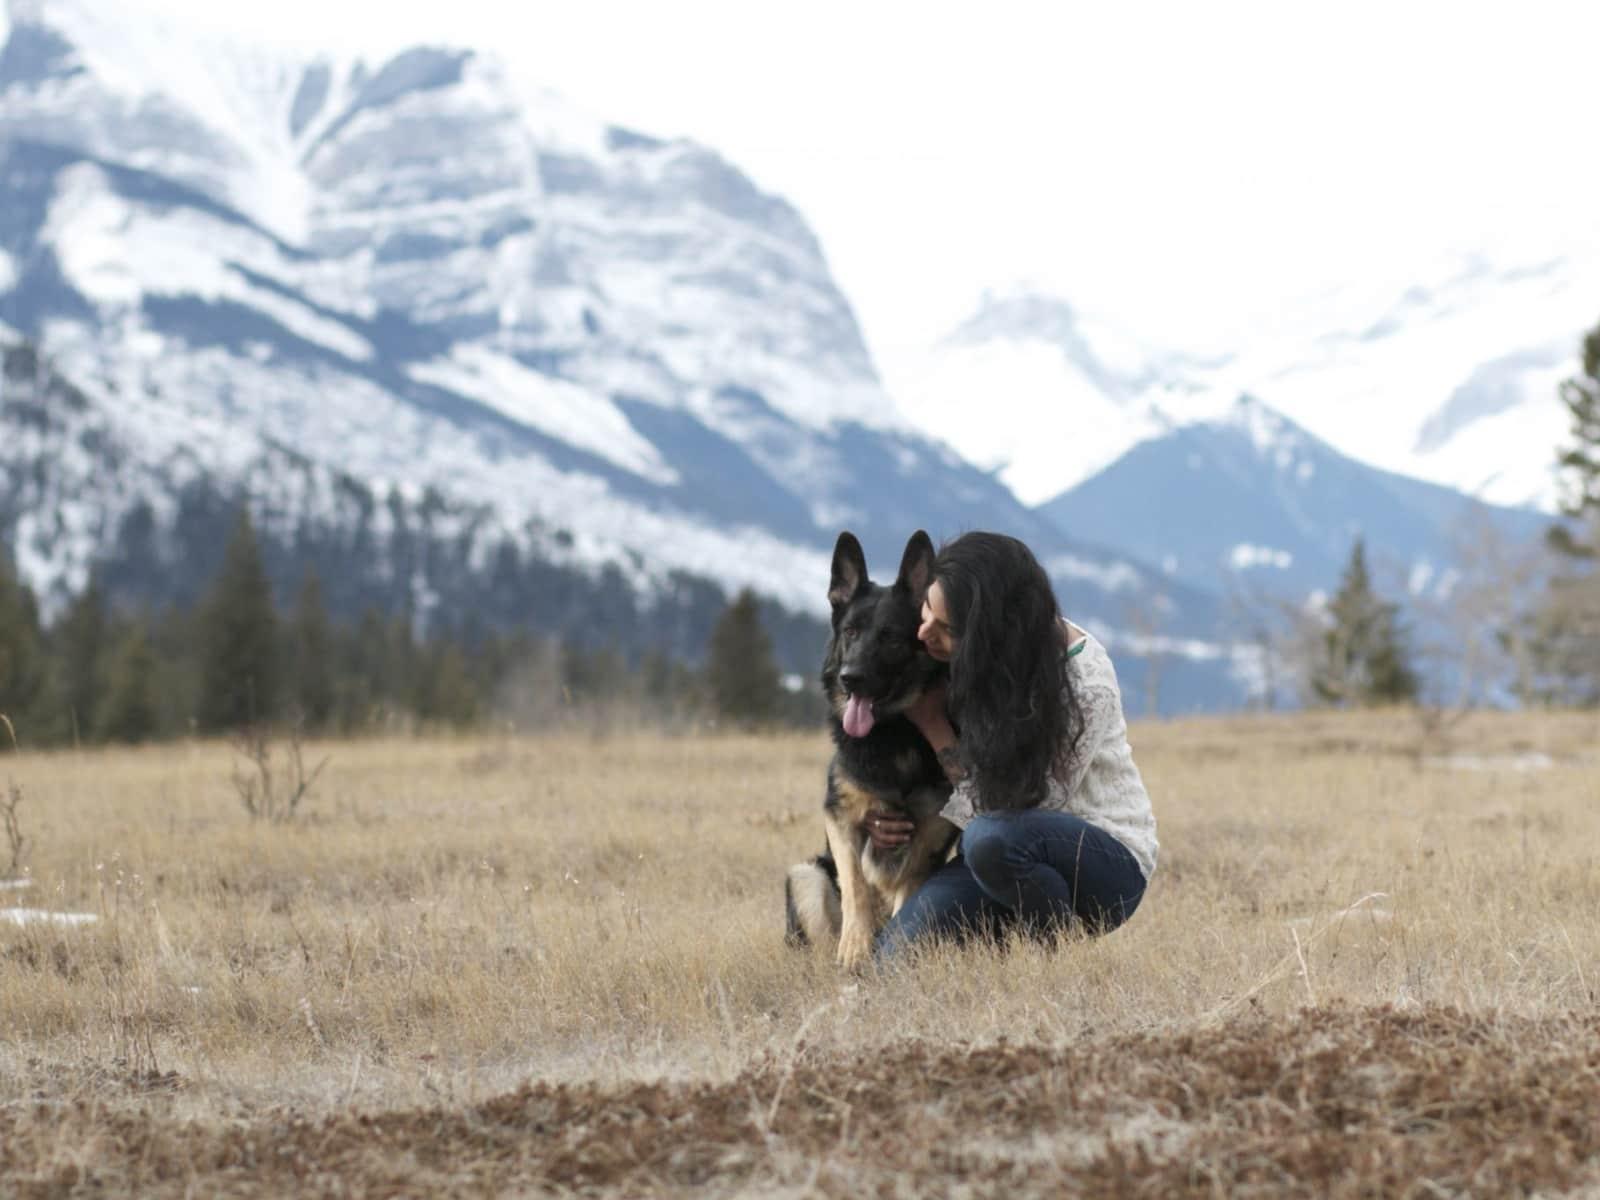 Nithya from Calgary, Alberta, Canada